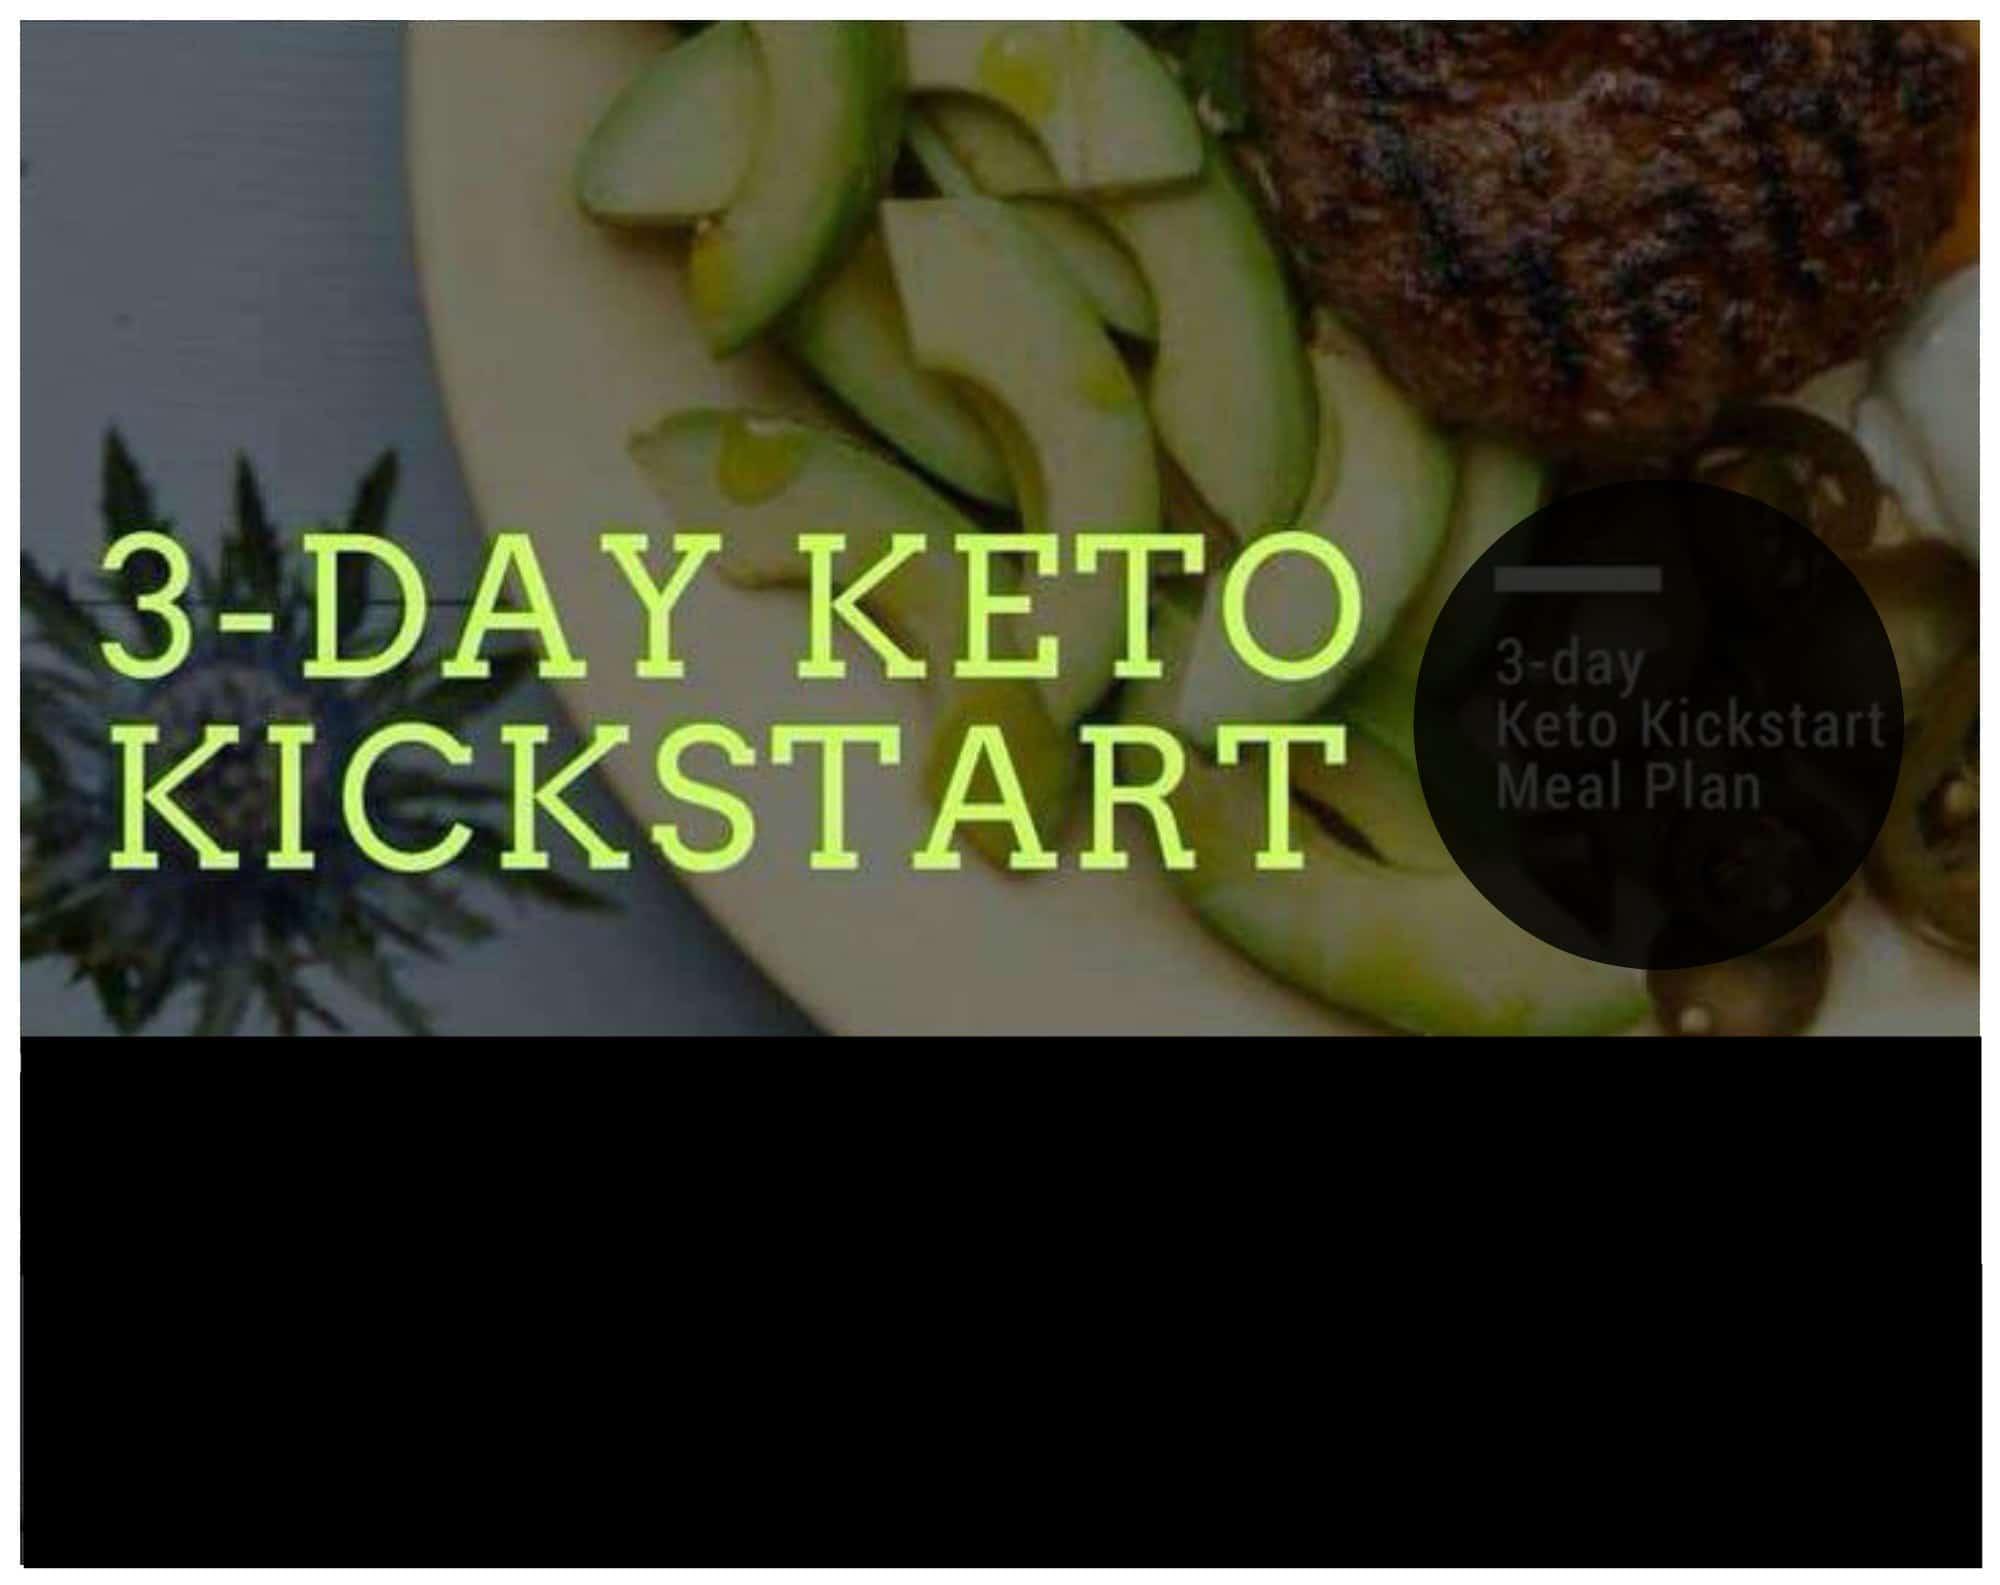 3 Day Keto Kickstart Meal Plan To Lose Weight Isavea2z Com